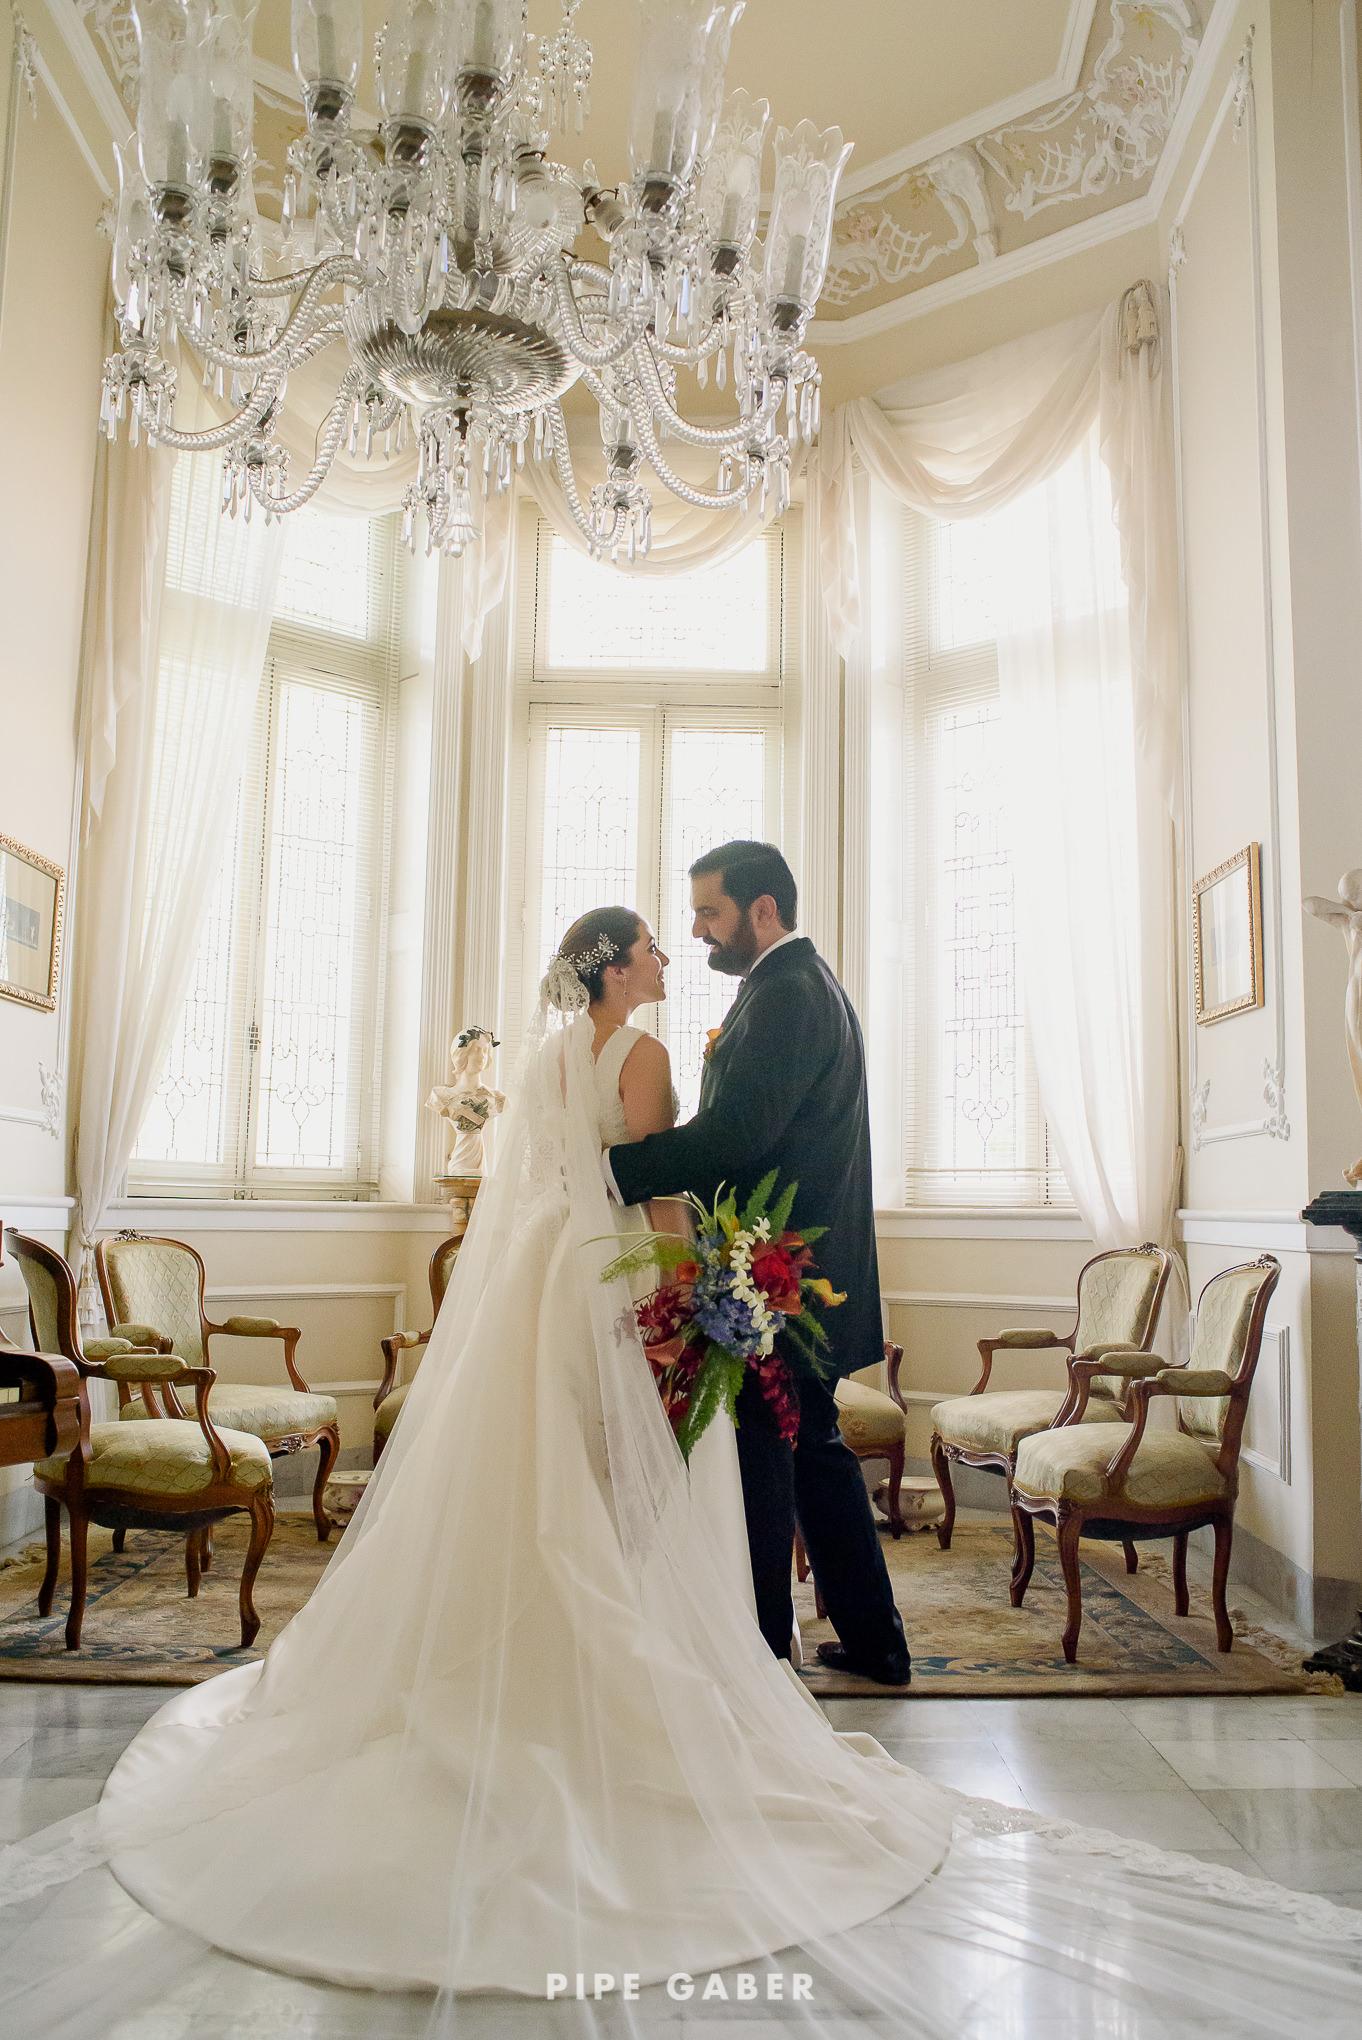 17_02_18_WEDDING_AIDITA_NEZBIT_MIGUEL_DOGRE_107_web.jpg